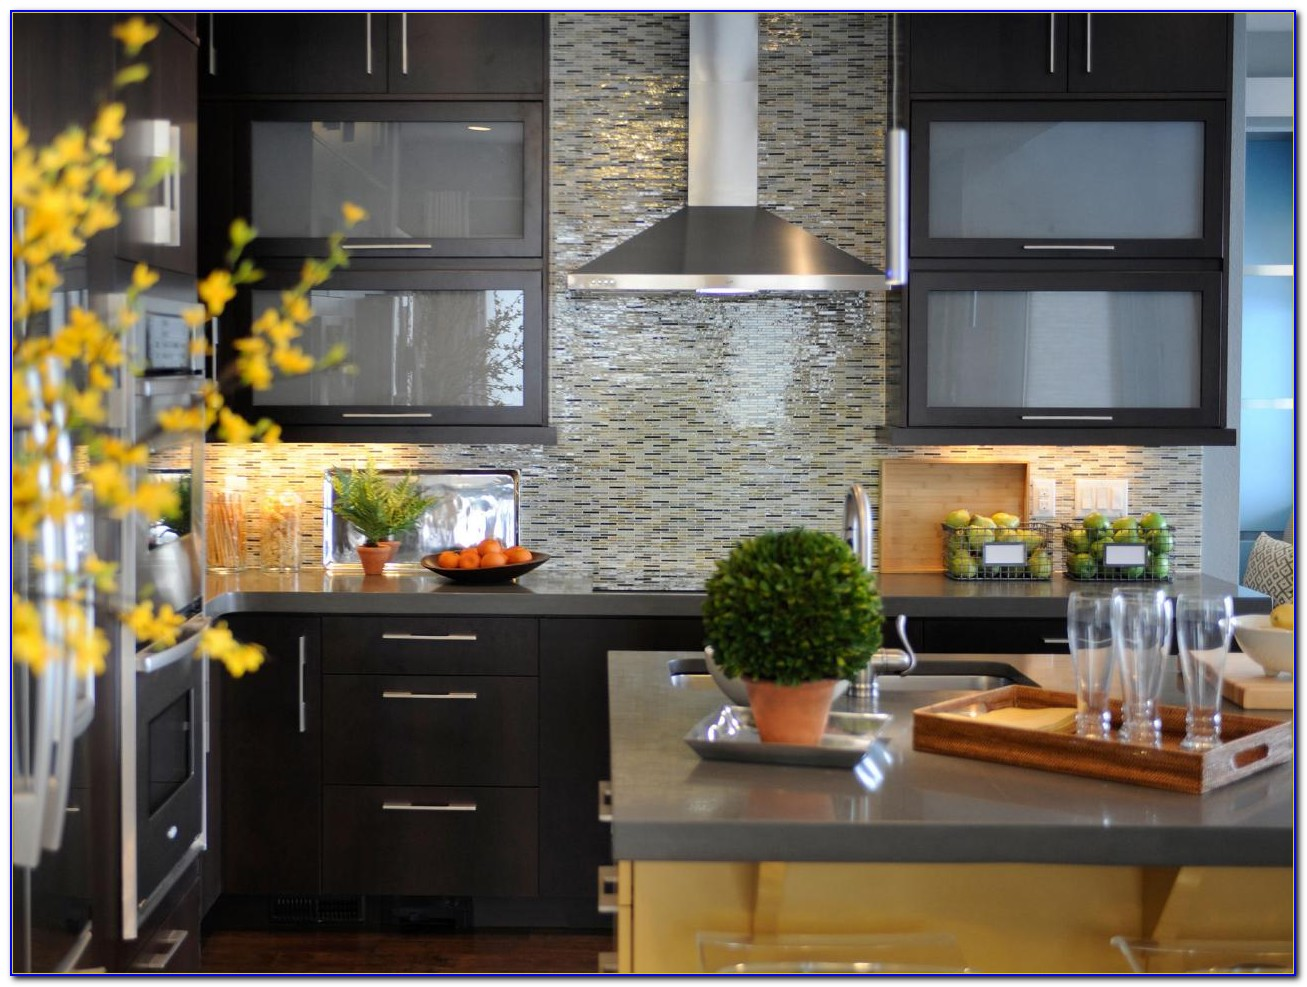 Backsplash Tiles For Kitchen Toronto